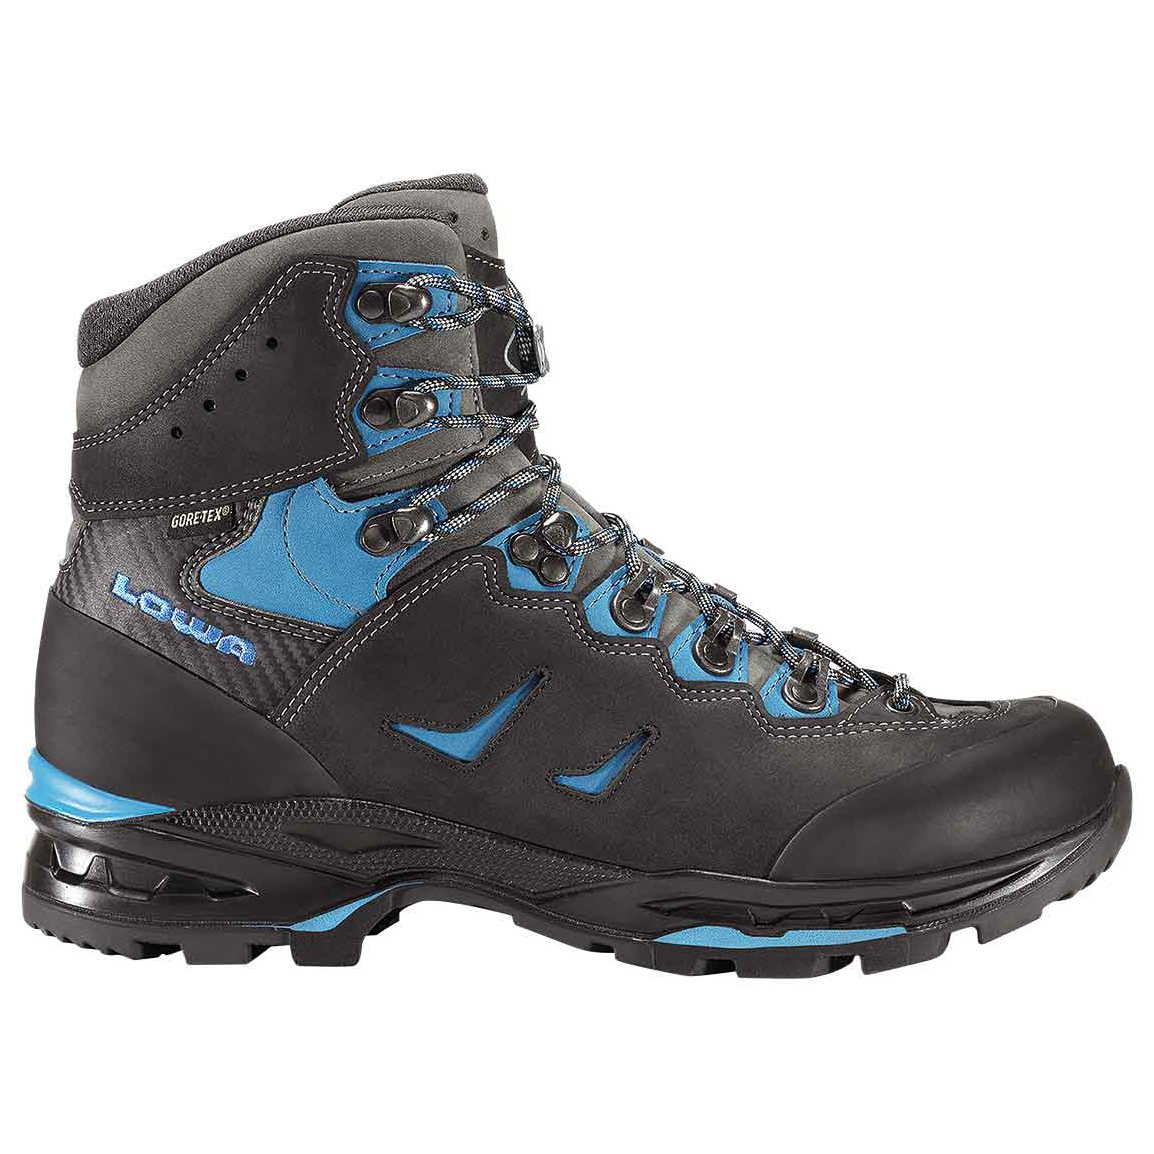 Lowa Camino GTX - Walking boots Men's